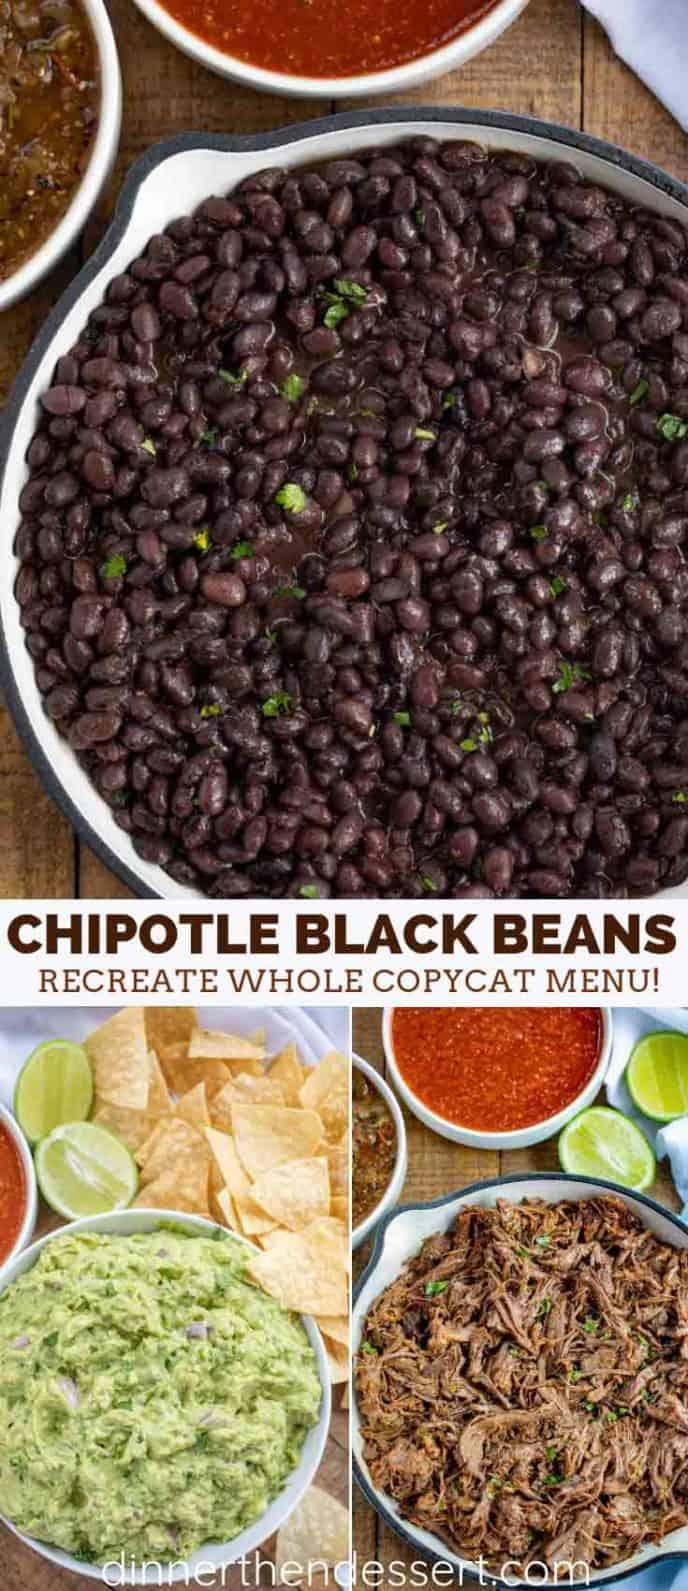 Chipotle Black Beans Recipe